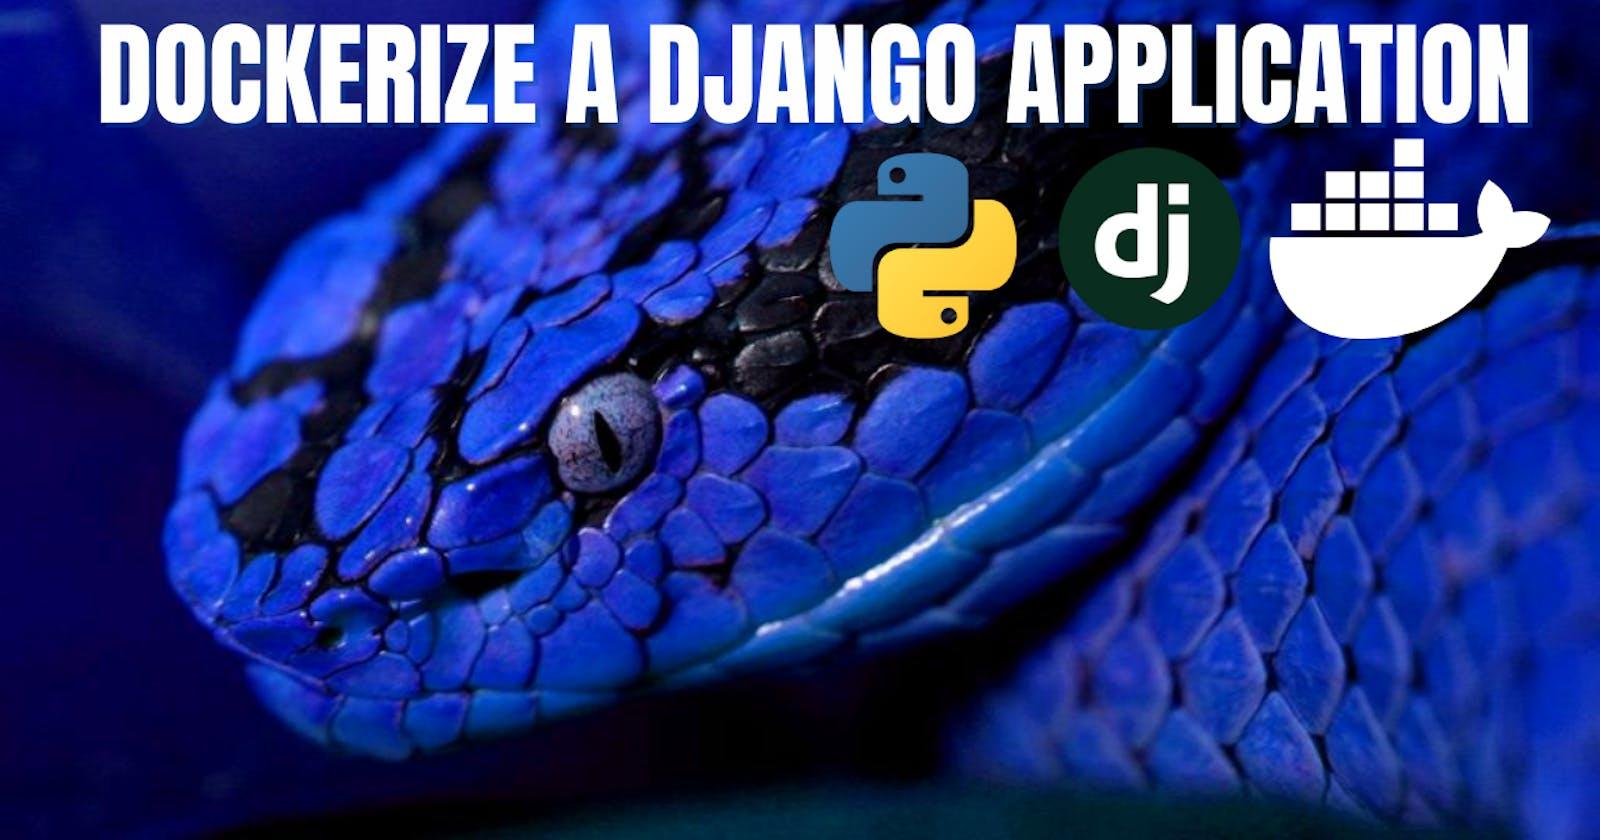 Dockerize a Django Application